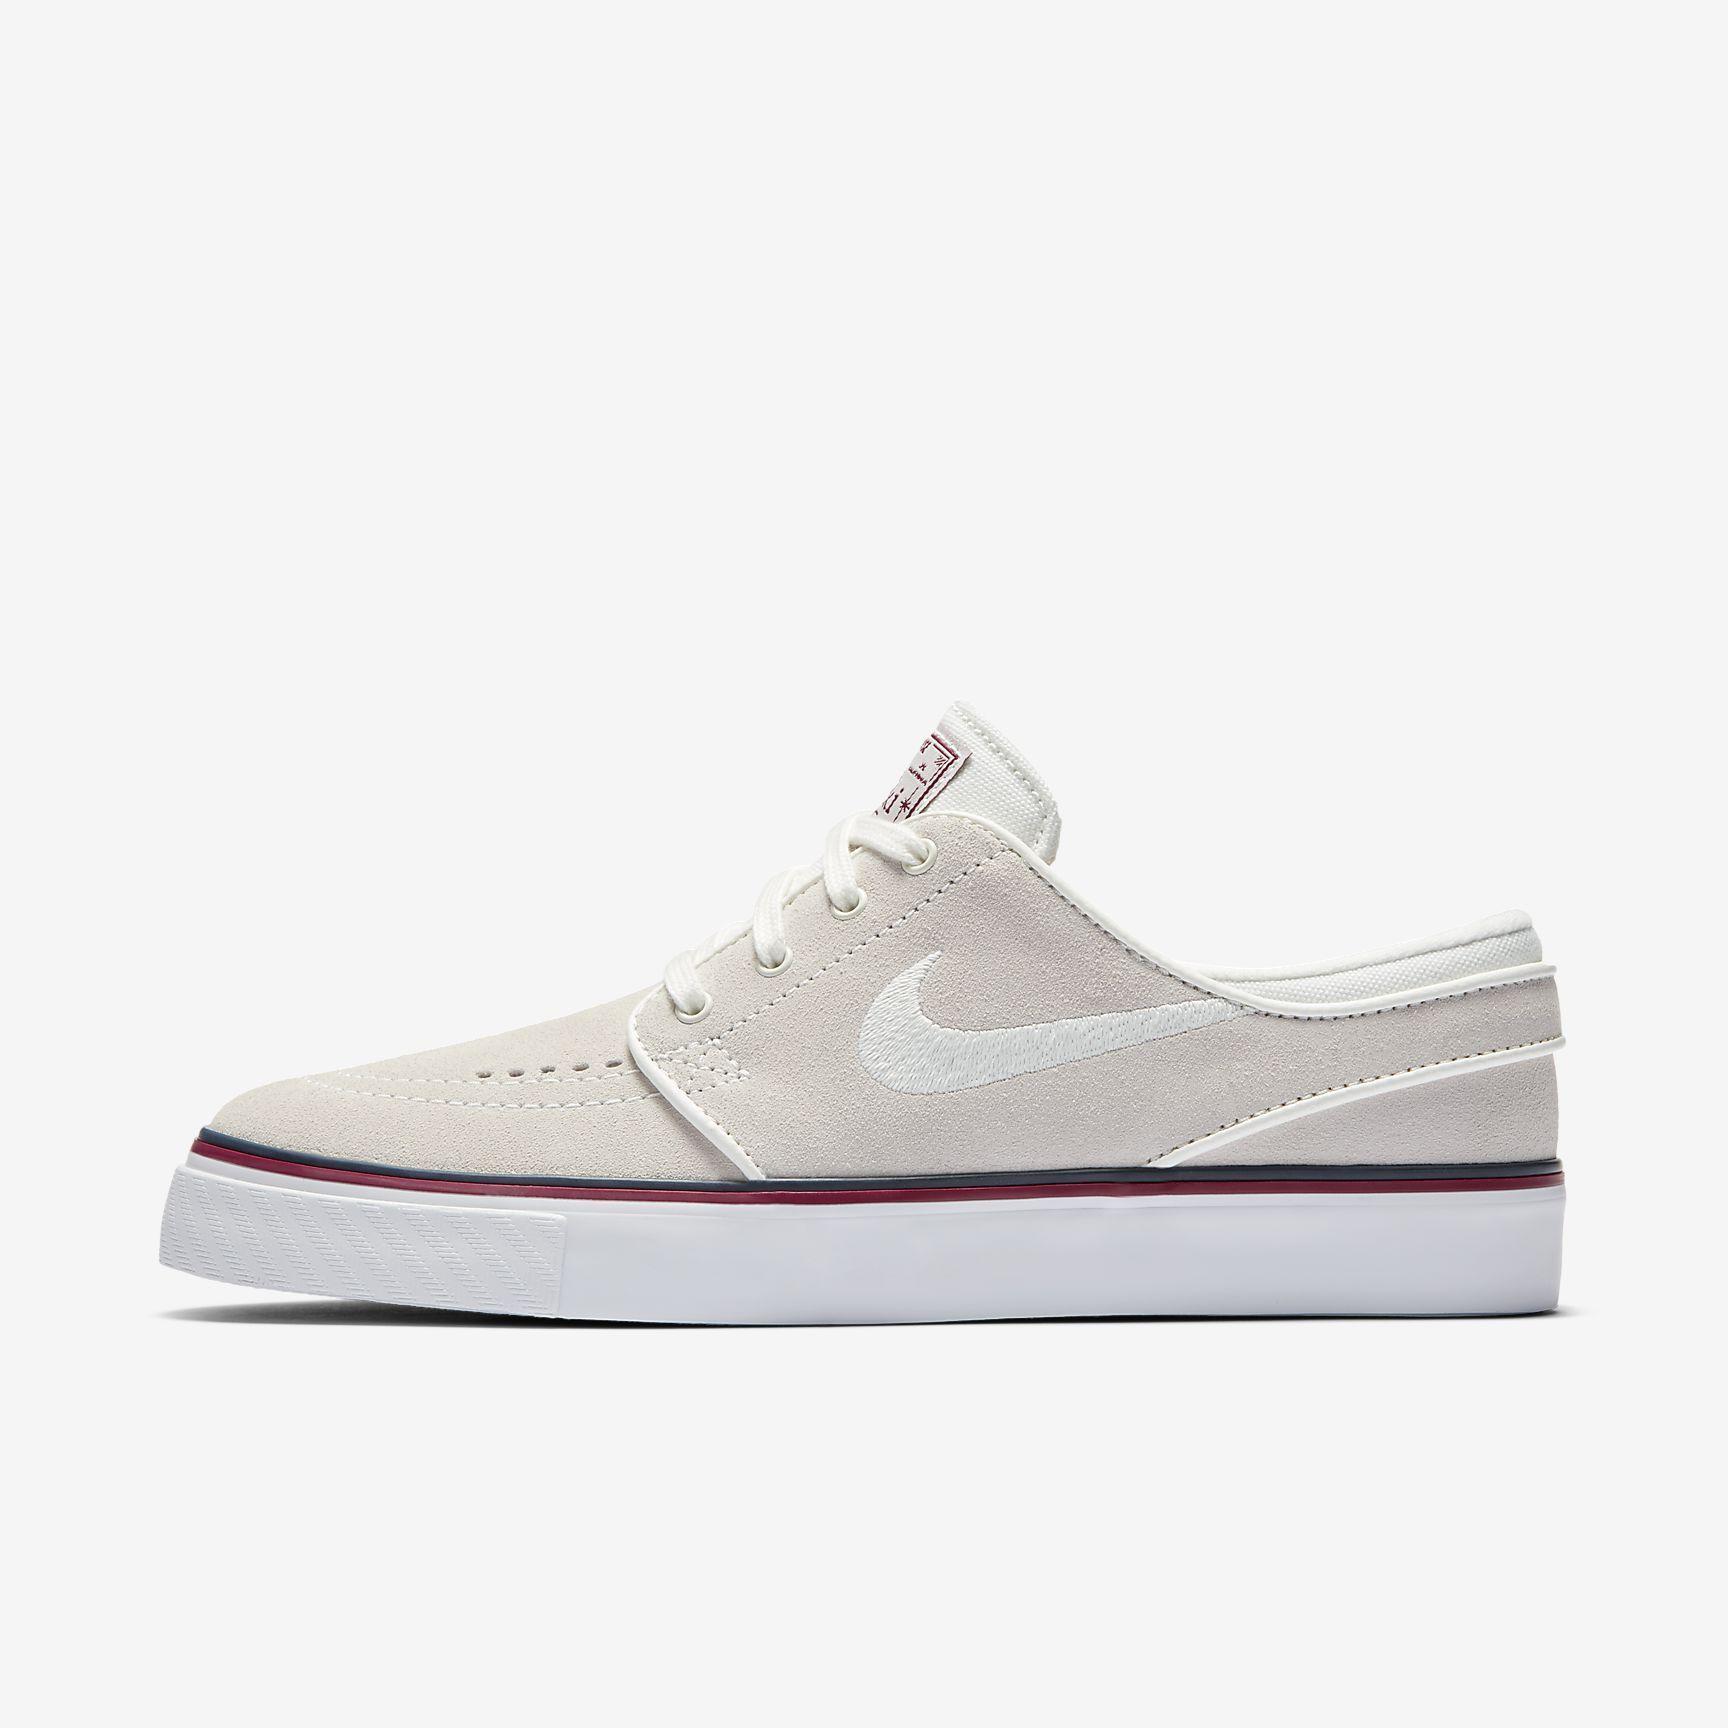 1df83d7eb2c3 ... discount code for nike sb air zoom stefan janoski womens skateboarding  shoe skateboardingshoes 60c9e f1700